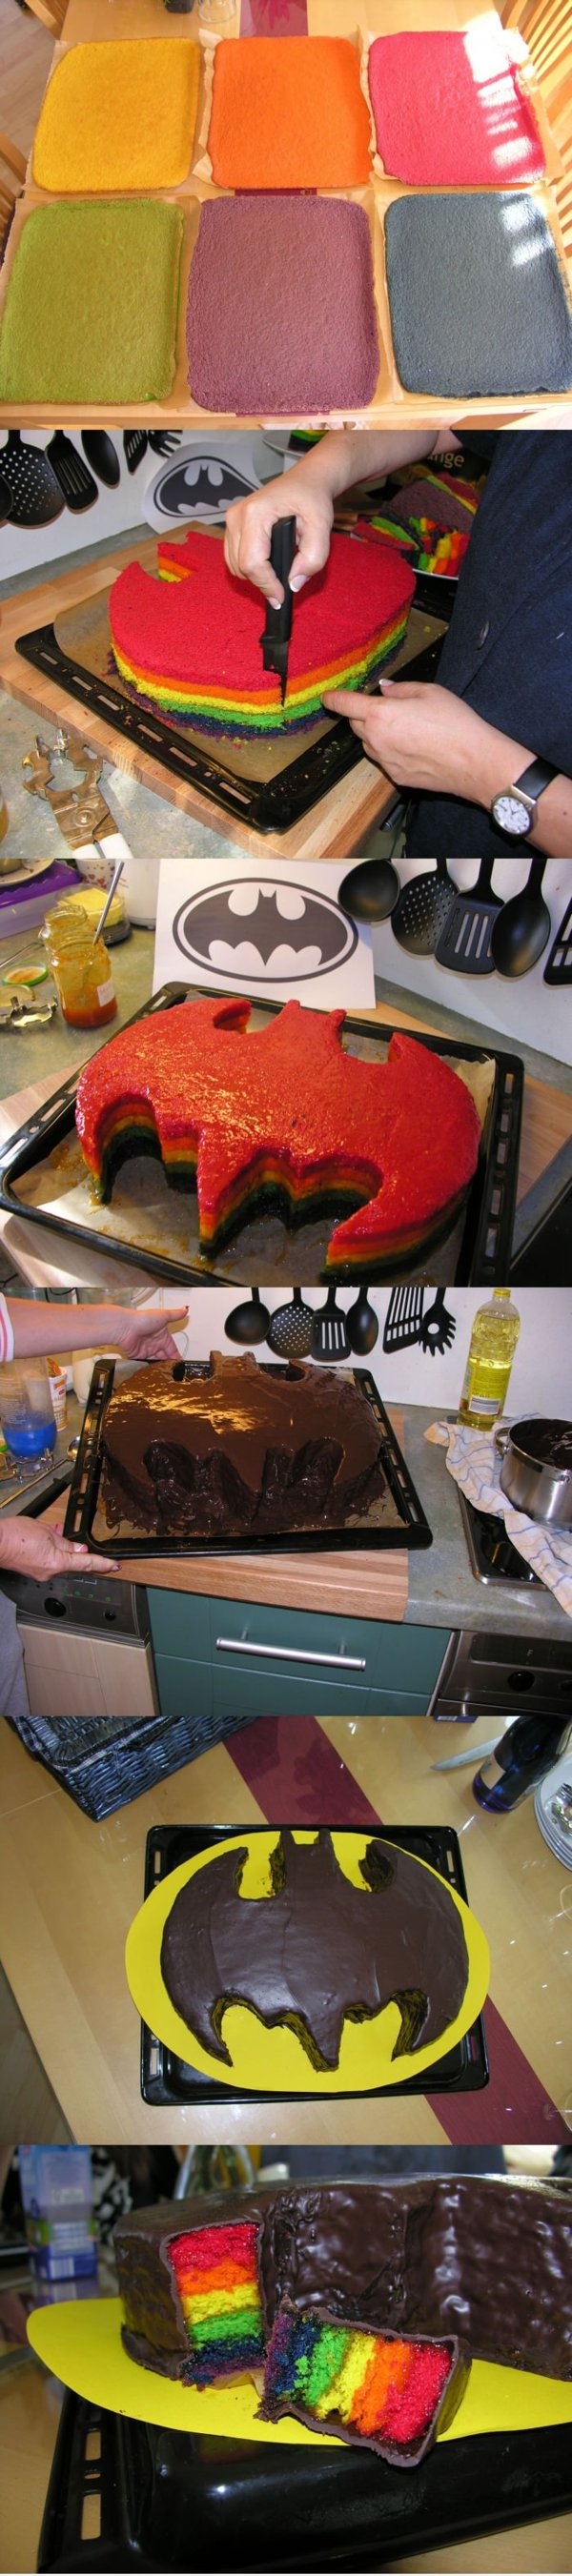 Batman-Cake-1